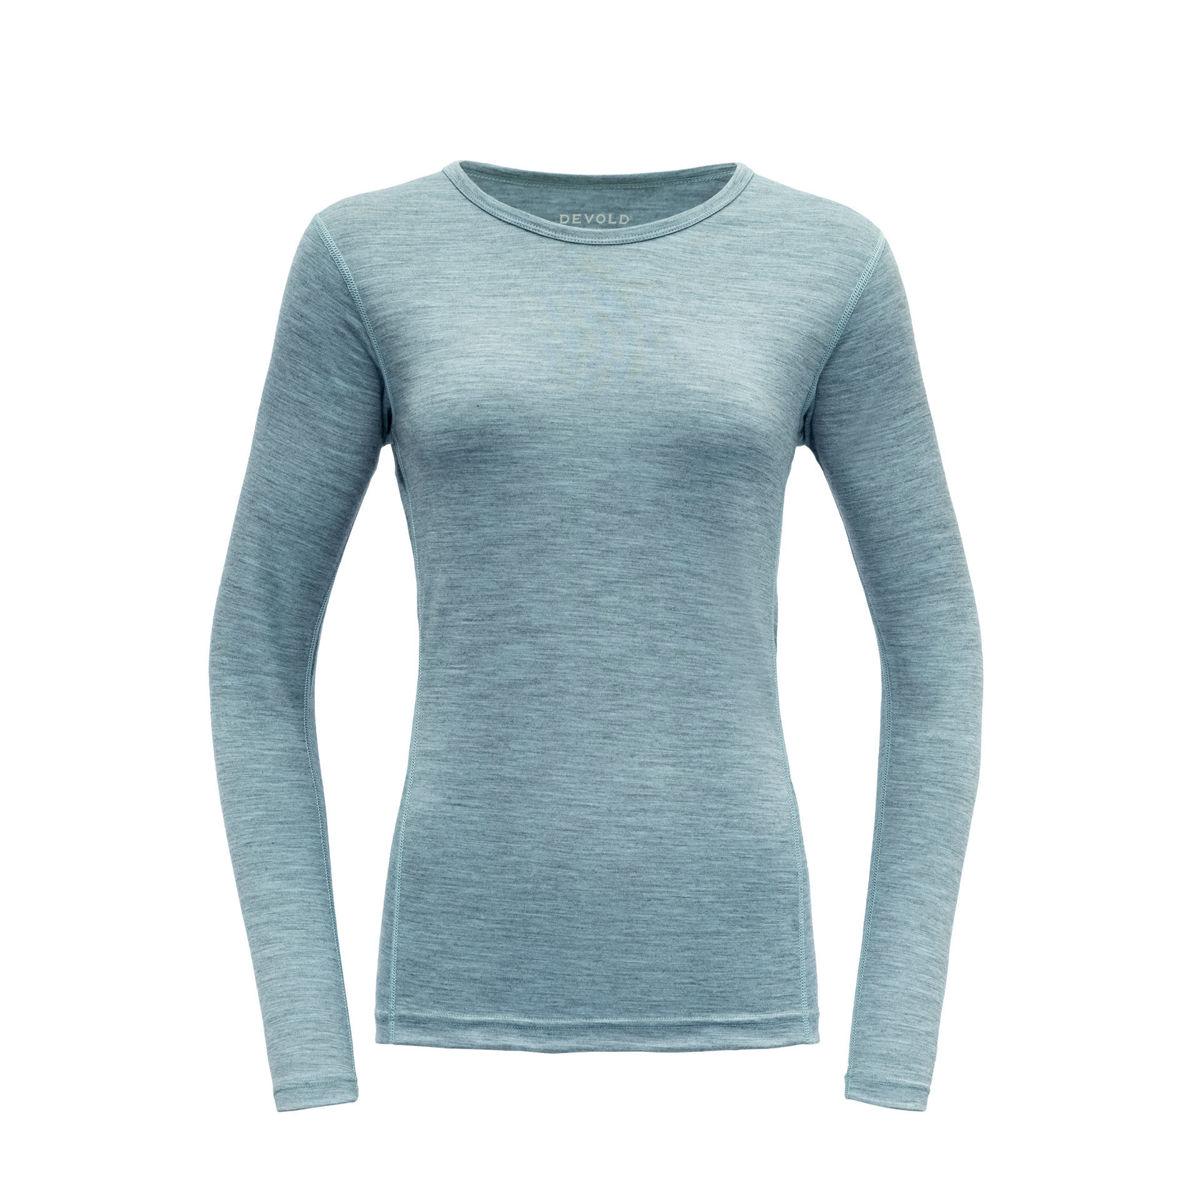 Bilde av Devold  Breeze Woman Shirt 317A Cameo Melange